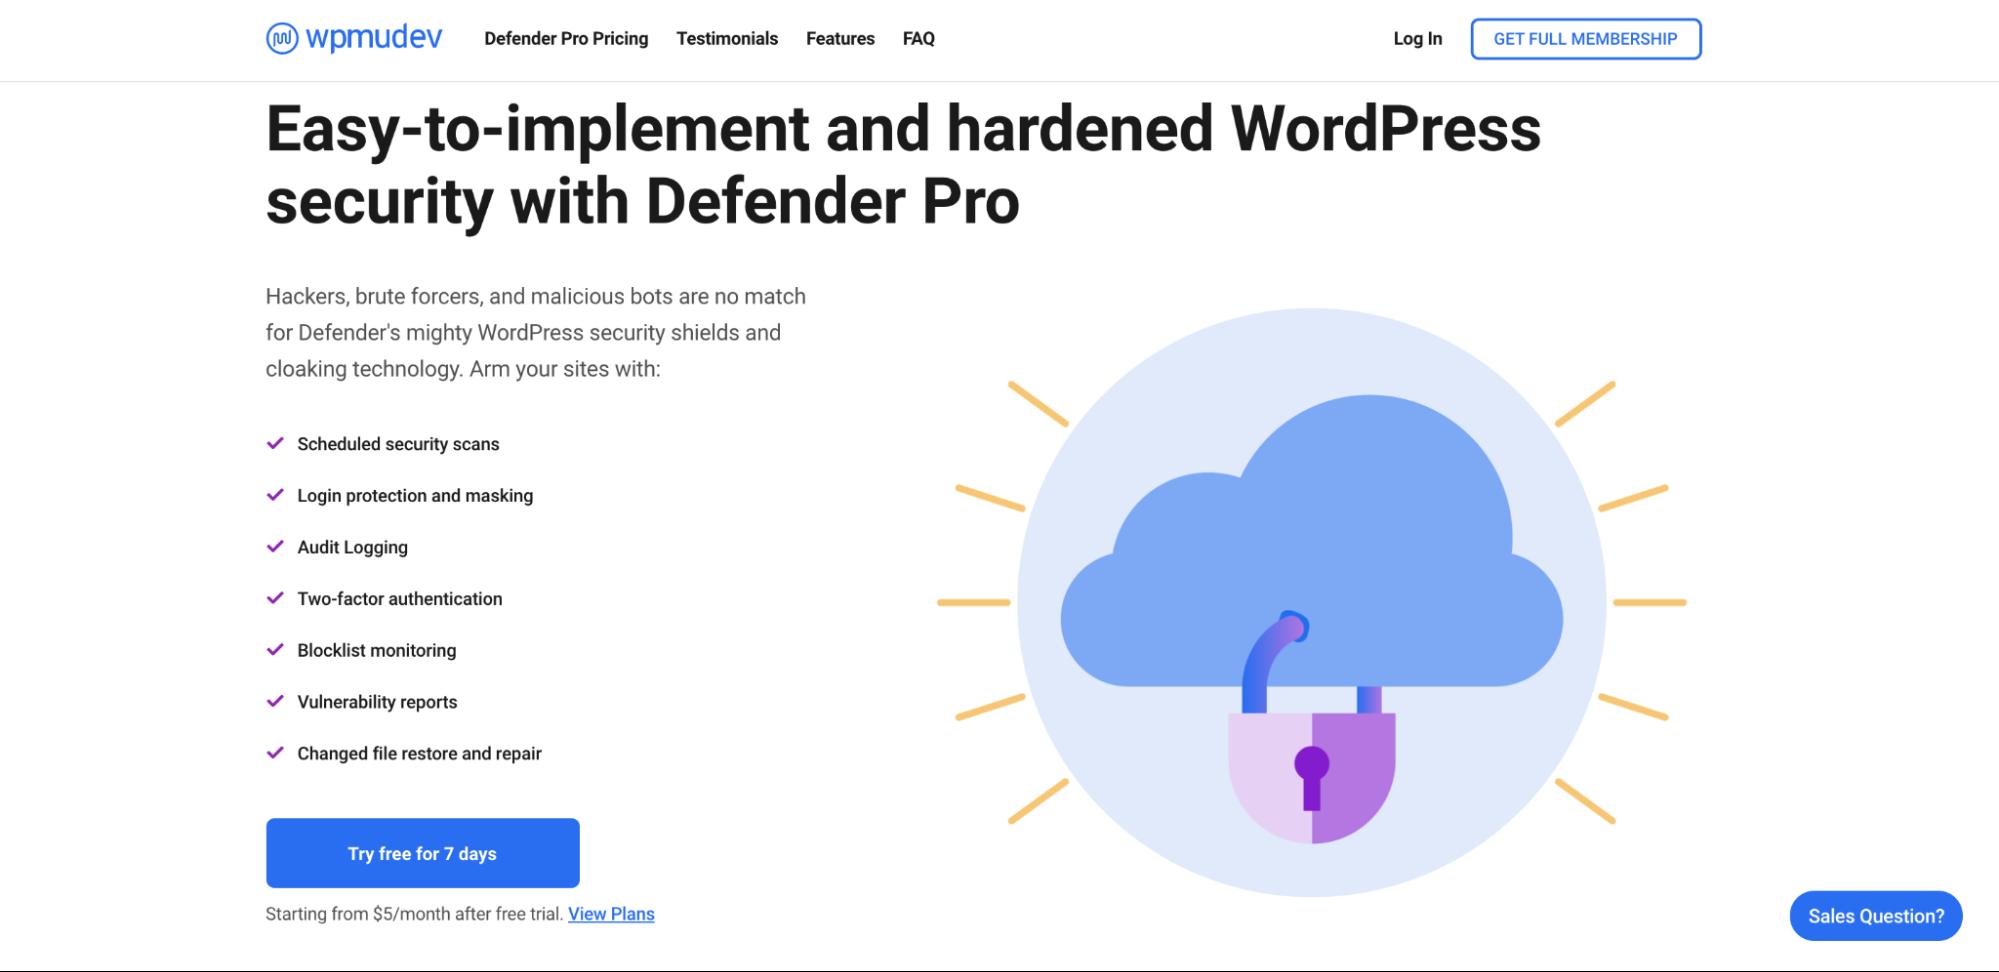 WPMUDev landing page for Defender Pro